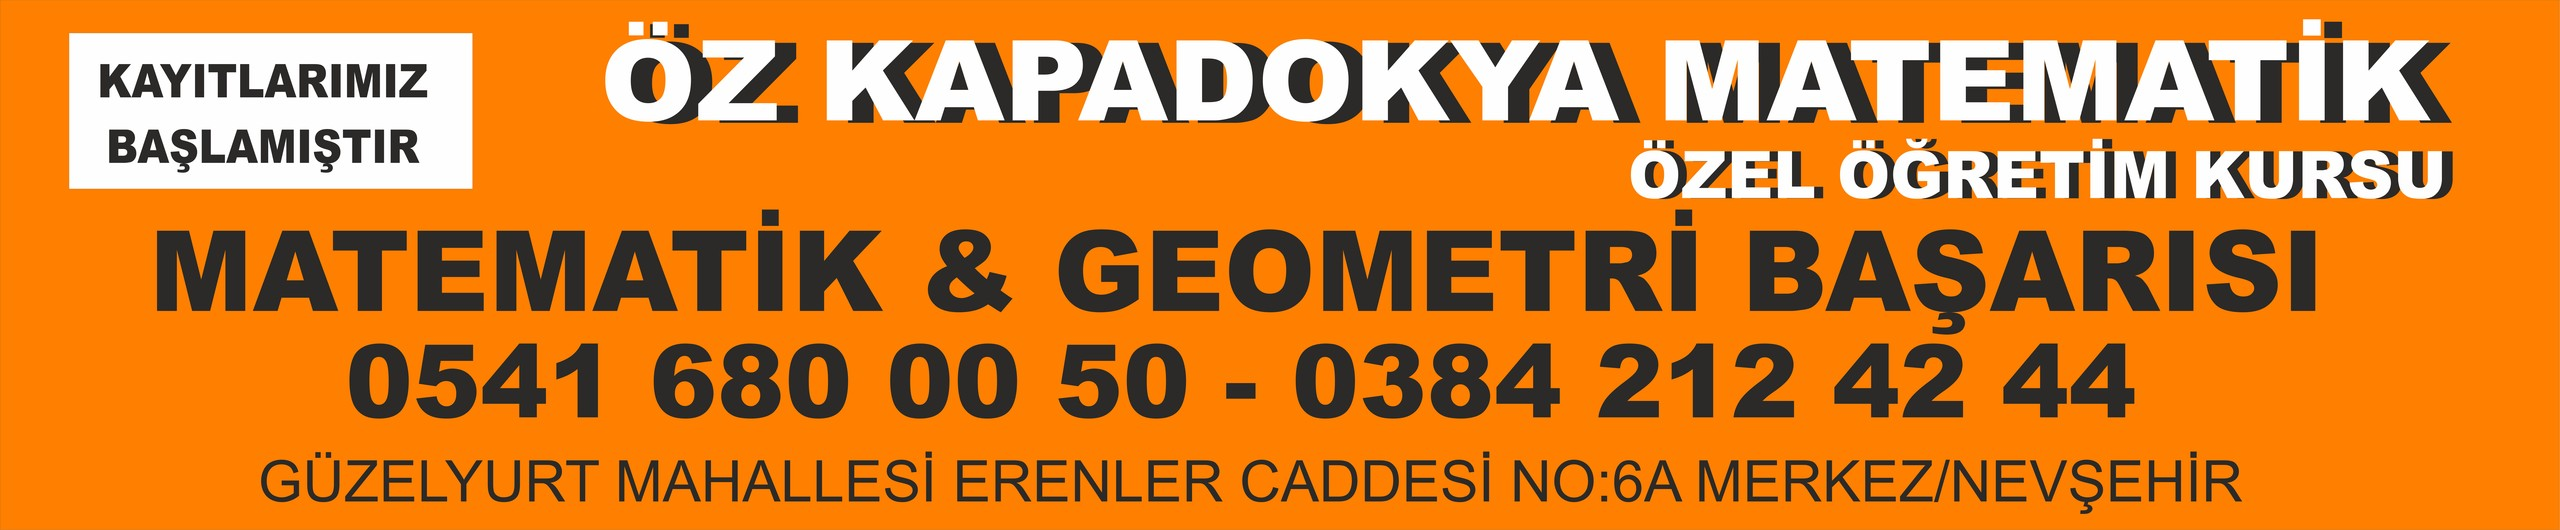 Öz Kapadokya Matematik